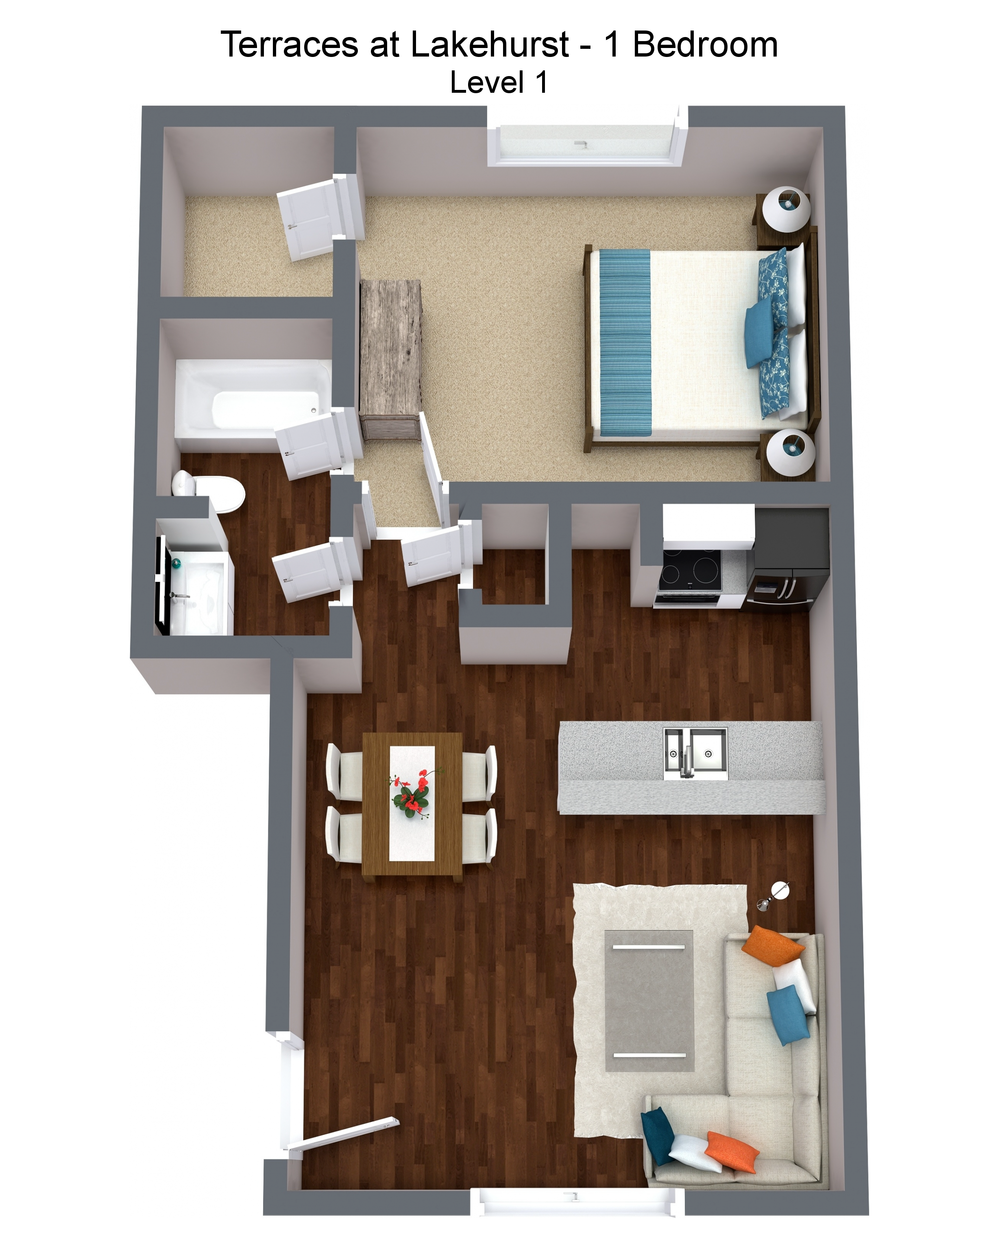 Terraces at Lakehurst - 1 Bedroom - Level 1 - 3D Floor Plan.png